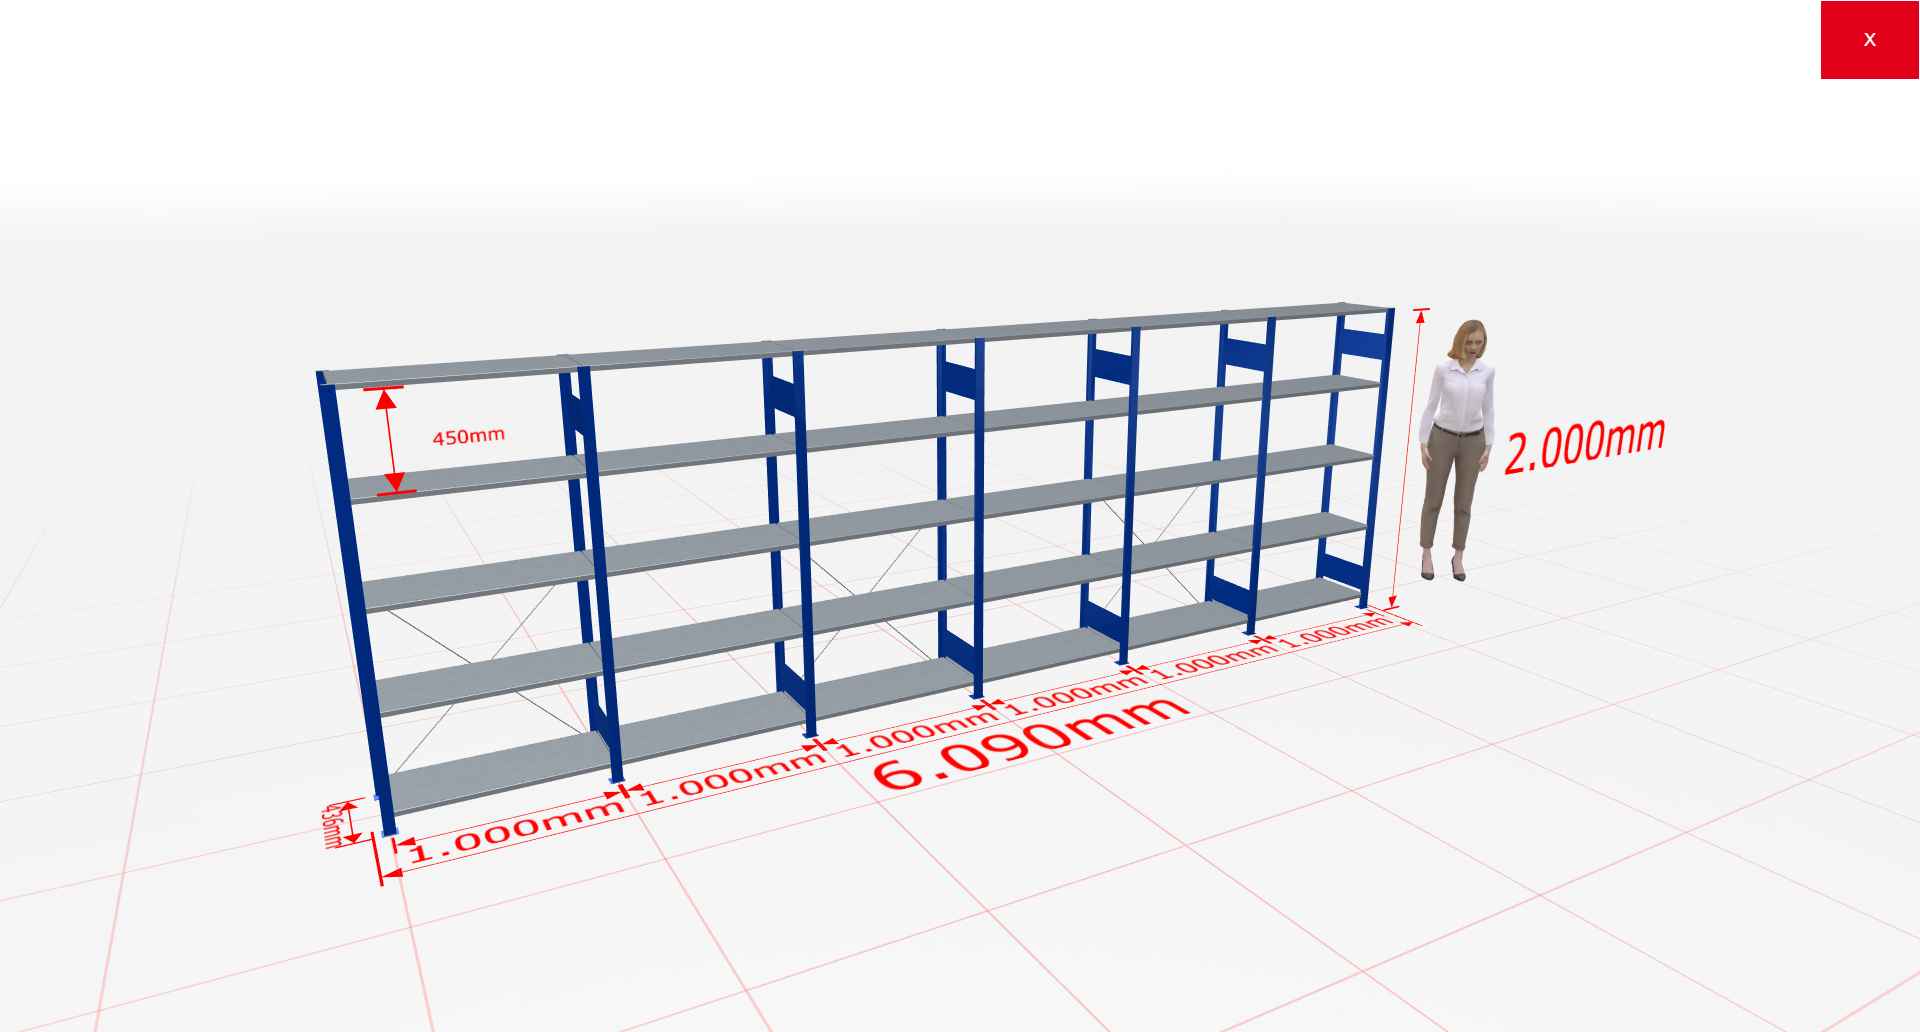 Fachbodenregal Komplettregal 2000x6090x400 mm (HxBxT) SCHULTE Lagertechnik blau 5 Ebenen  150 kg je Boden